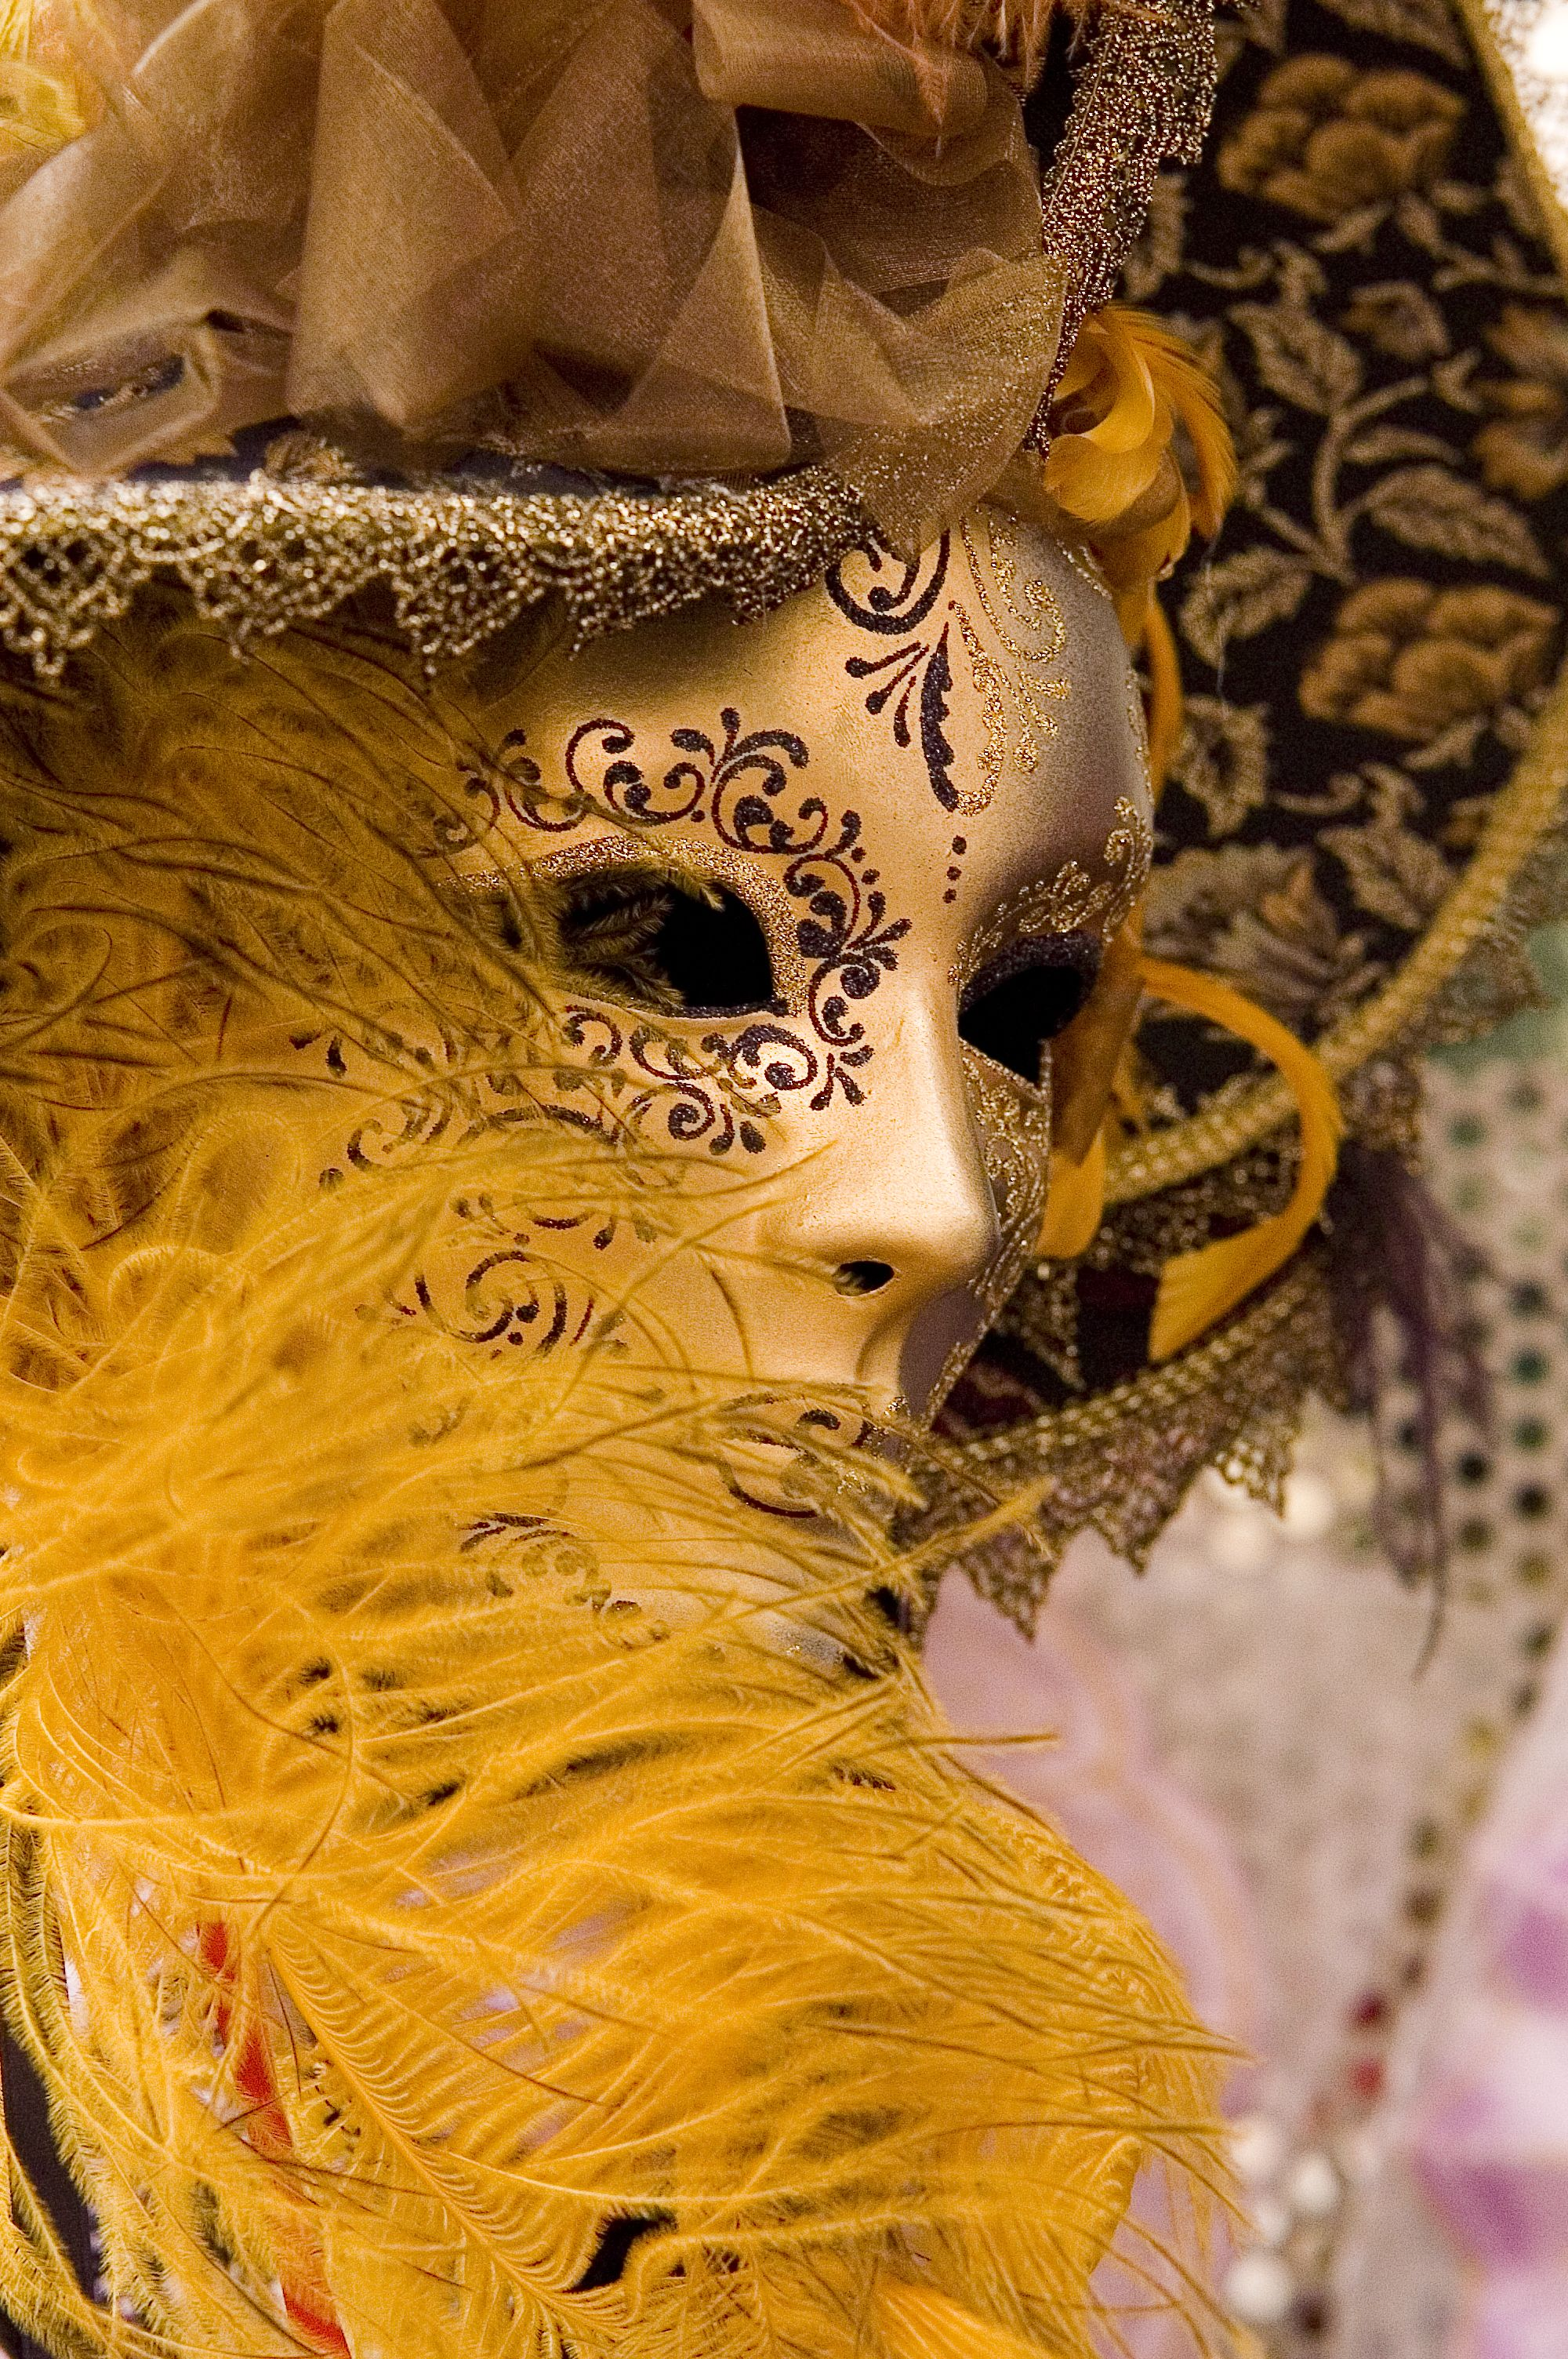 71a996a9c6d6 Venetian carnival mask by terraaprile.deviantart.com | Crafts ...